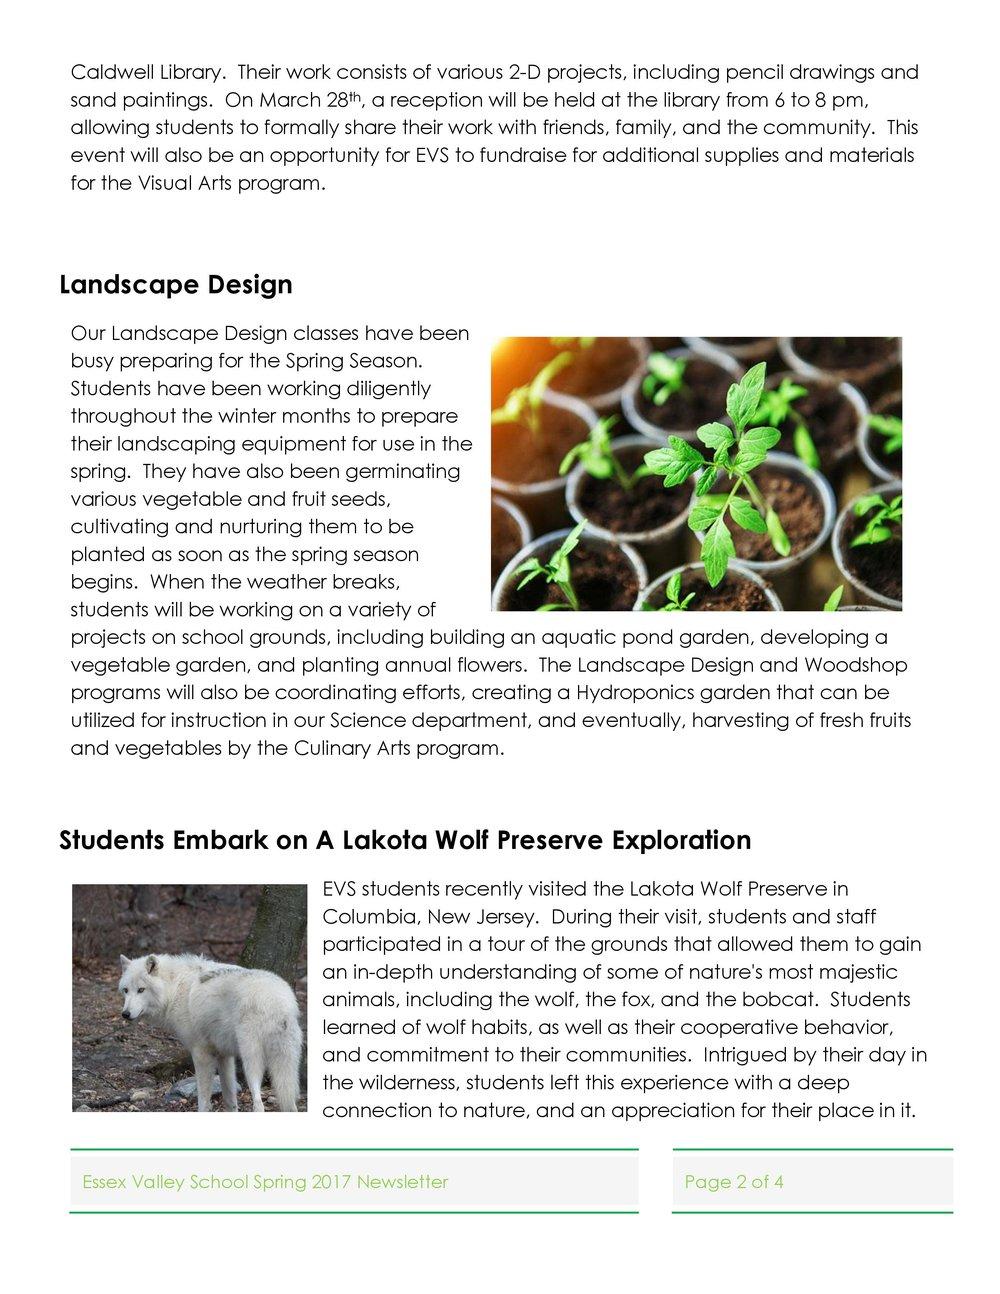 Spring Newsletter Revised 3-22-17-page-003.jpg